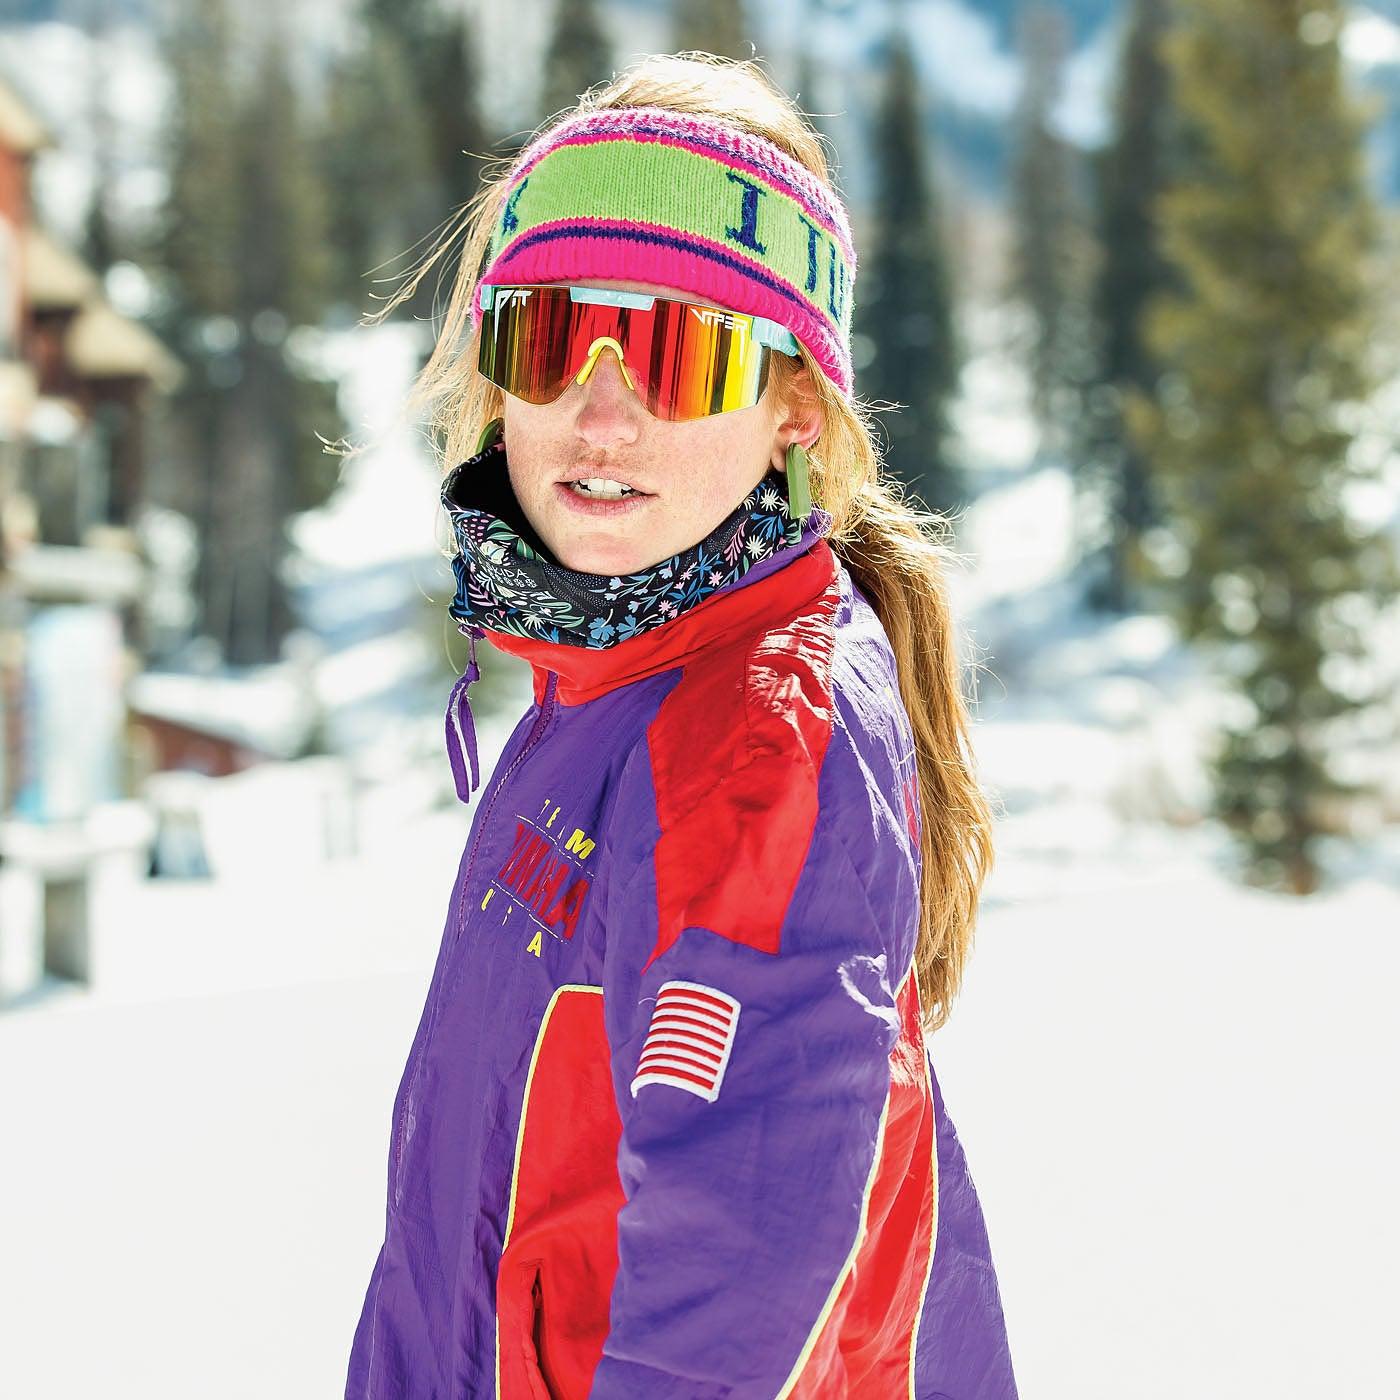 Courtney Harkins, Ski Tester 2021